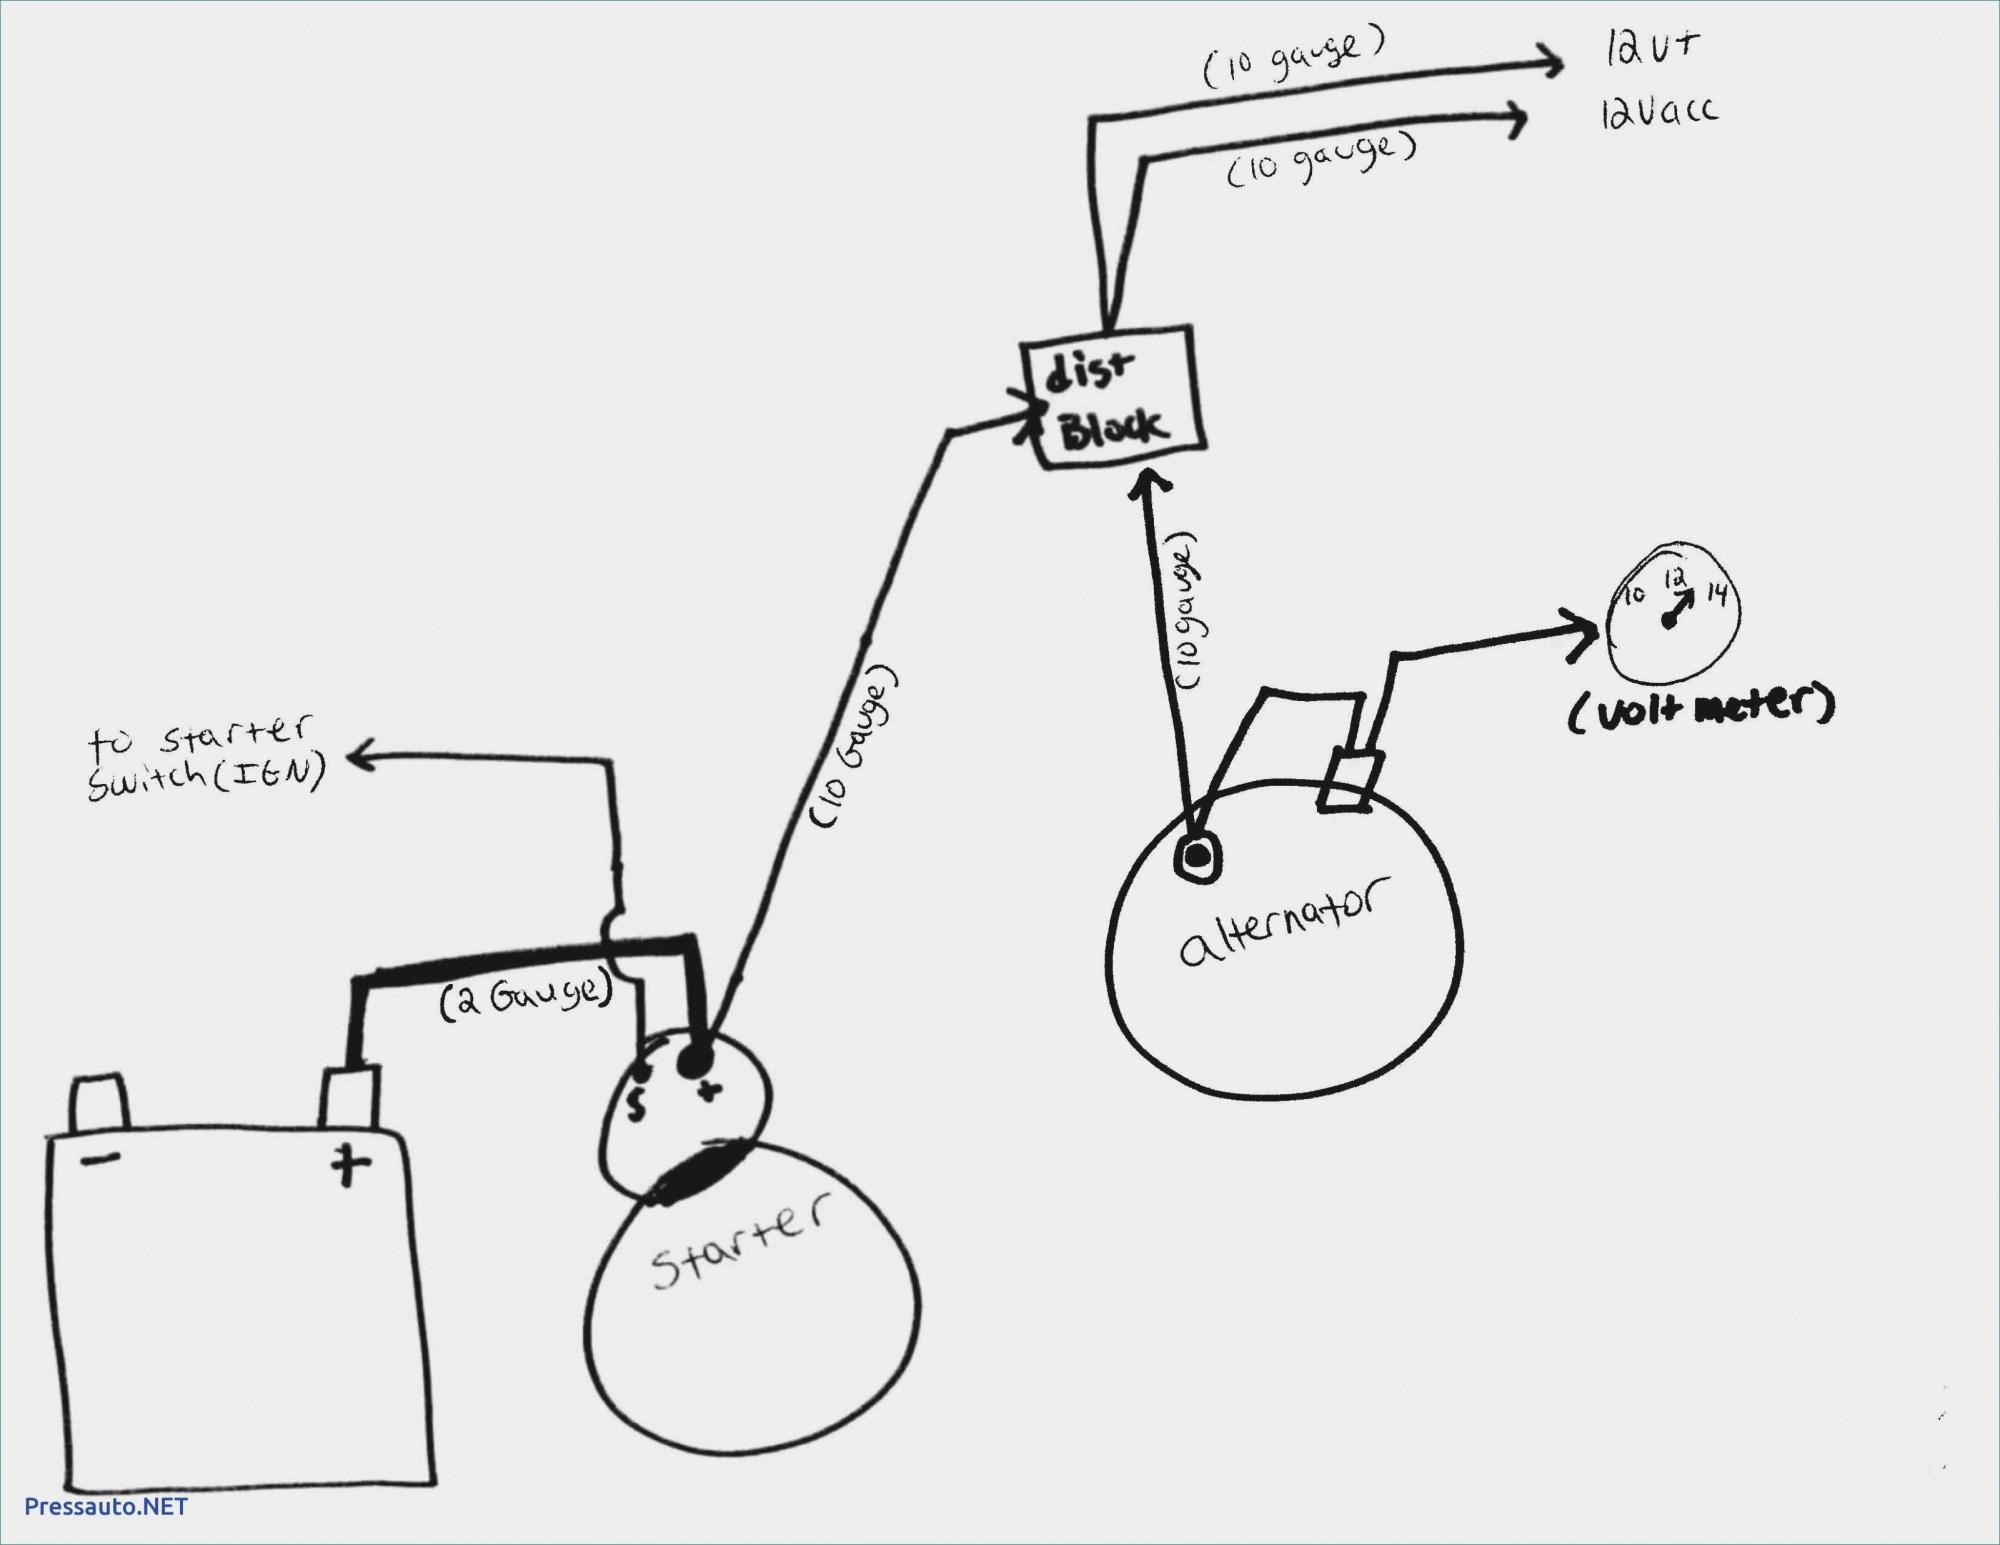 hight resolution of alternators wiring diagram 3 post online wiring diagram 2001 isuzu rodeo wiring diagram wiring diagram for